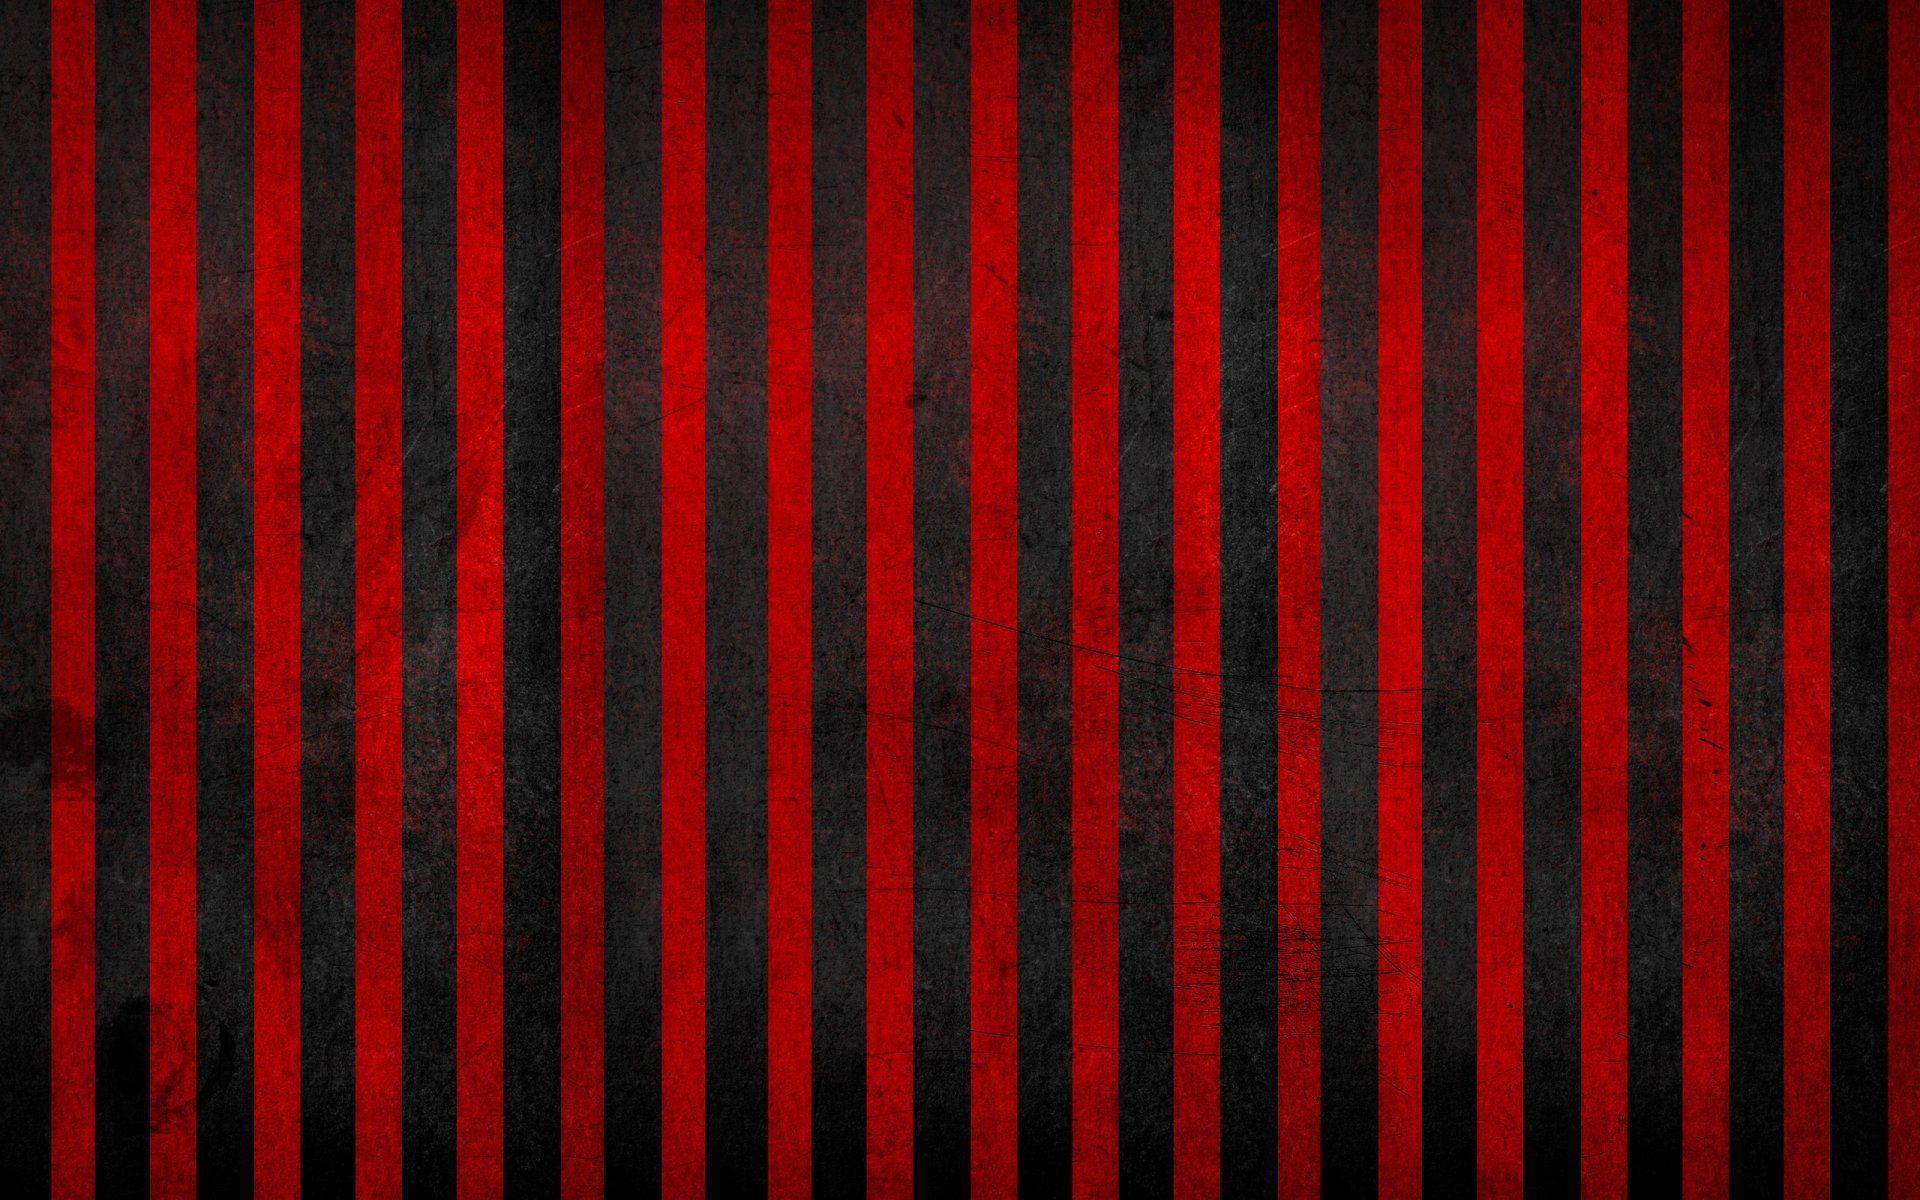 Lines Red Black Pattern Hd Wallpaper Estampas Vetores